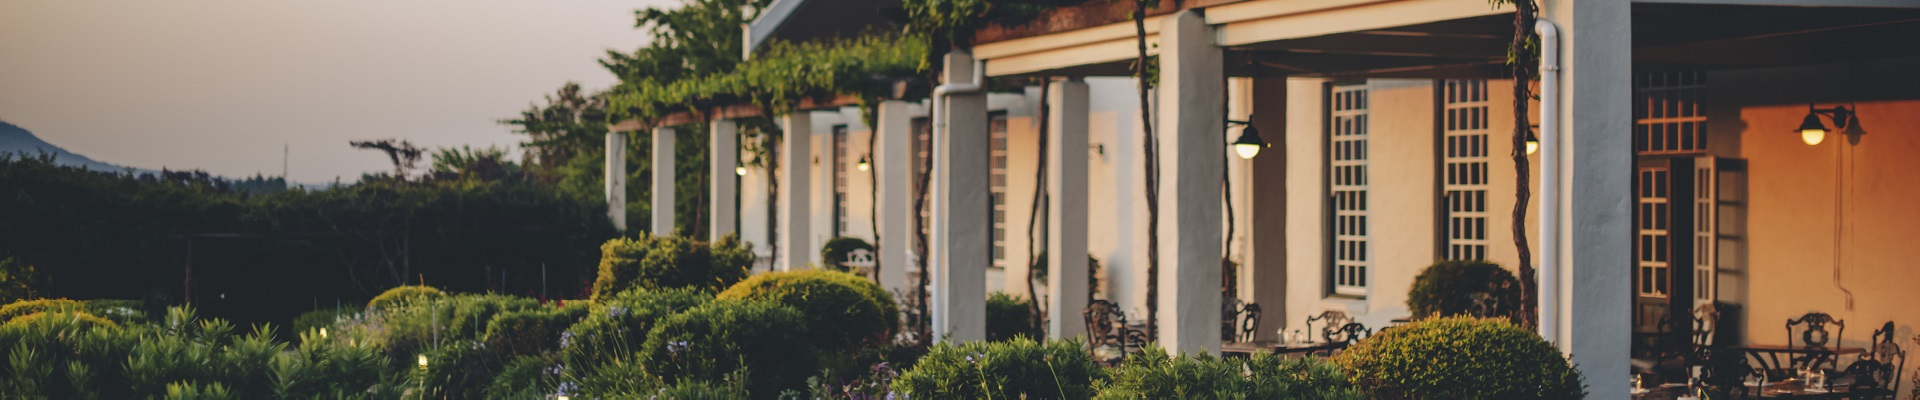 Avondale Wine Estate